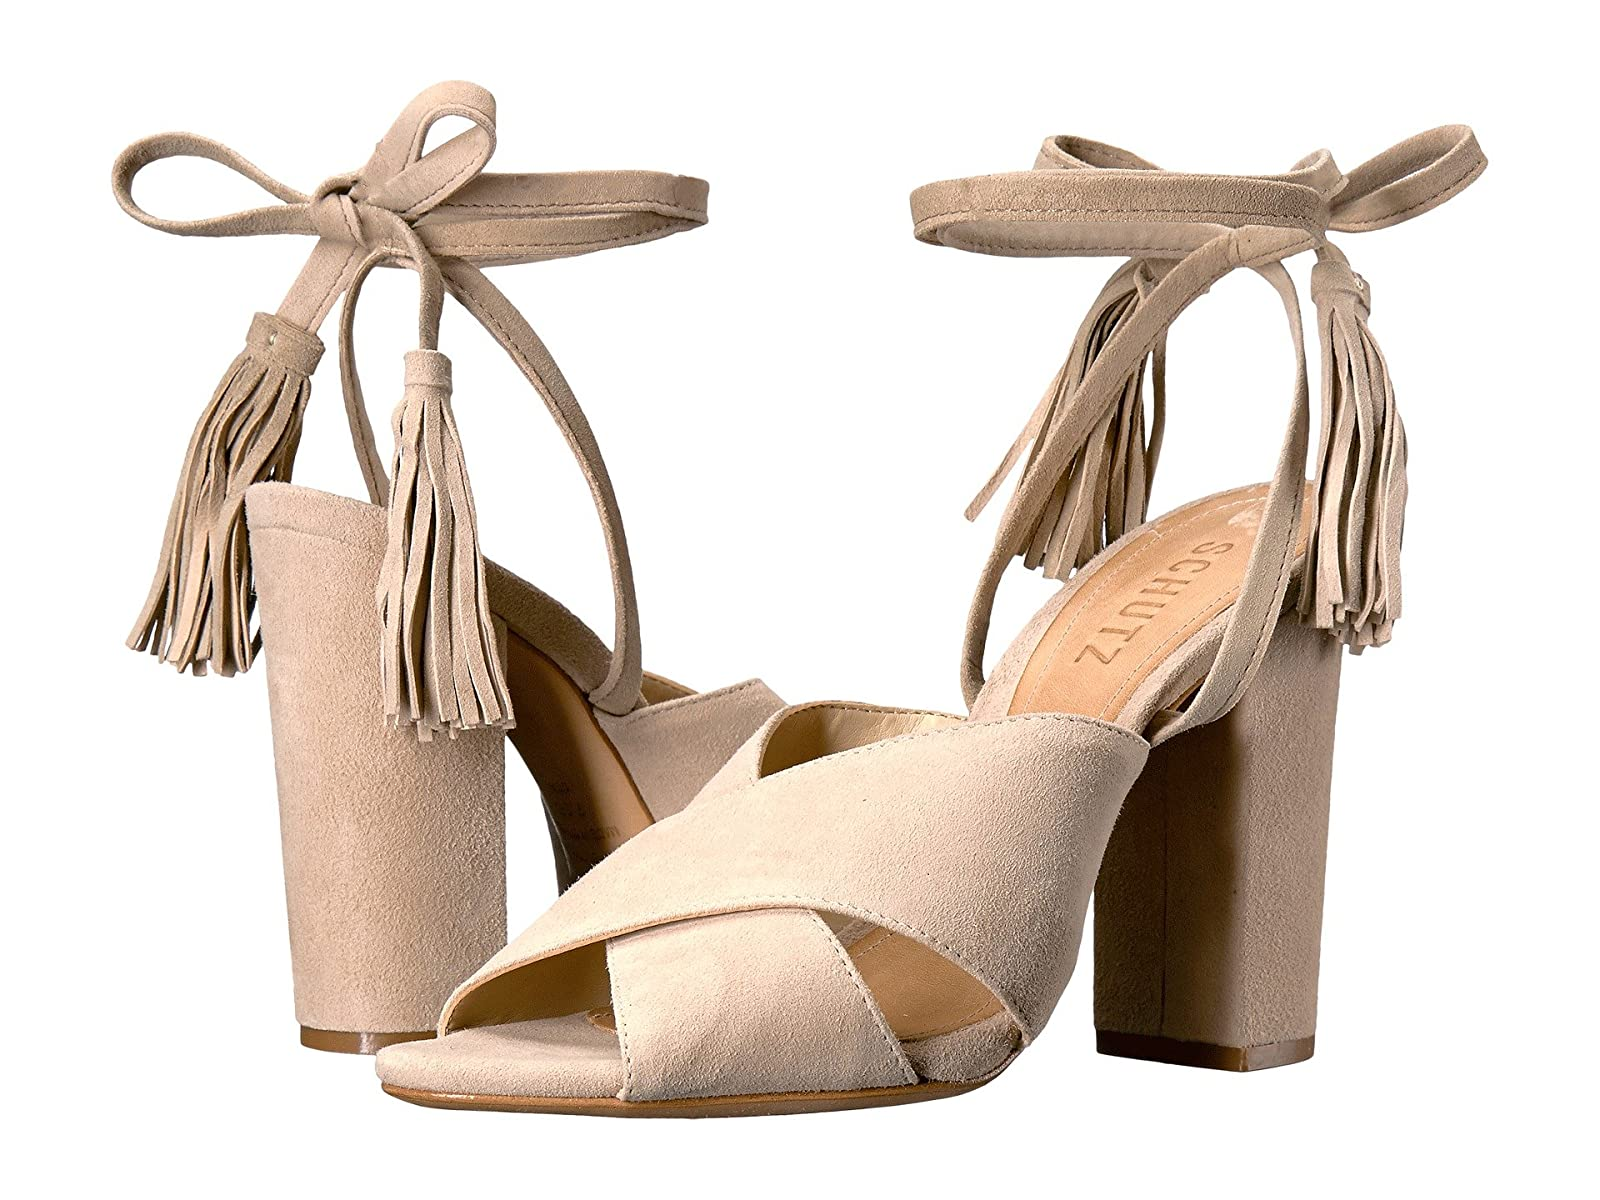 Schutz DamilaCheap and distinctive eye-catching shoes